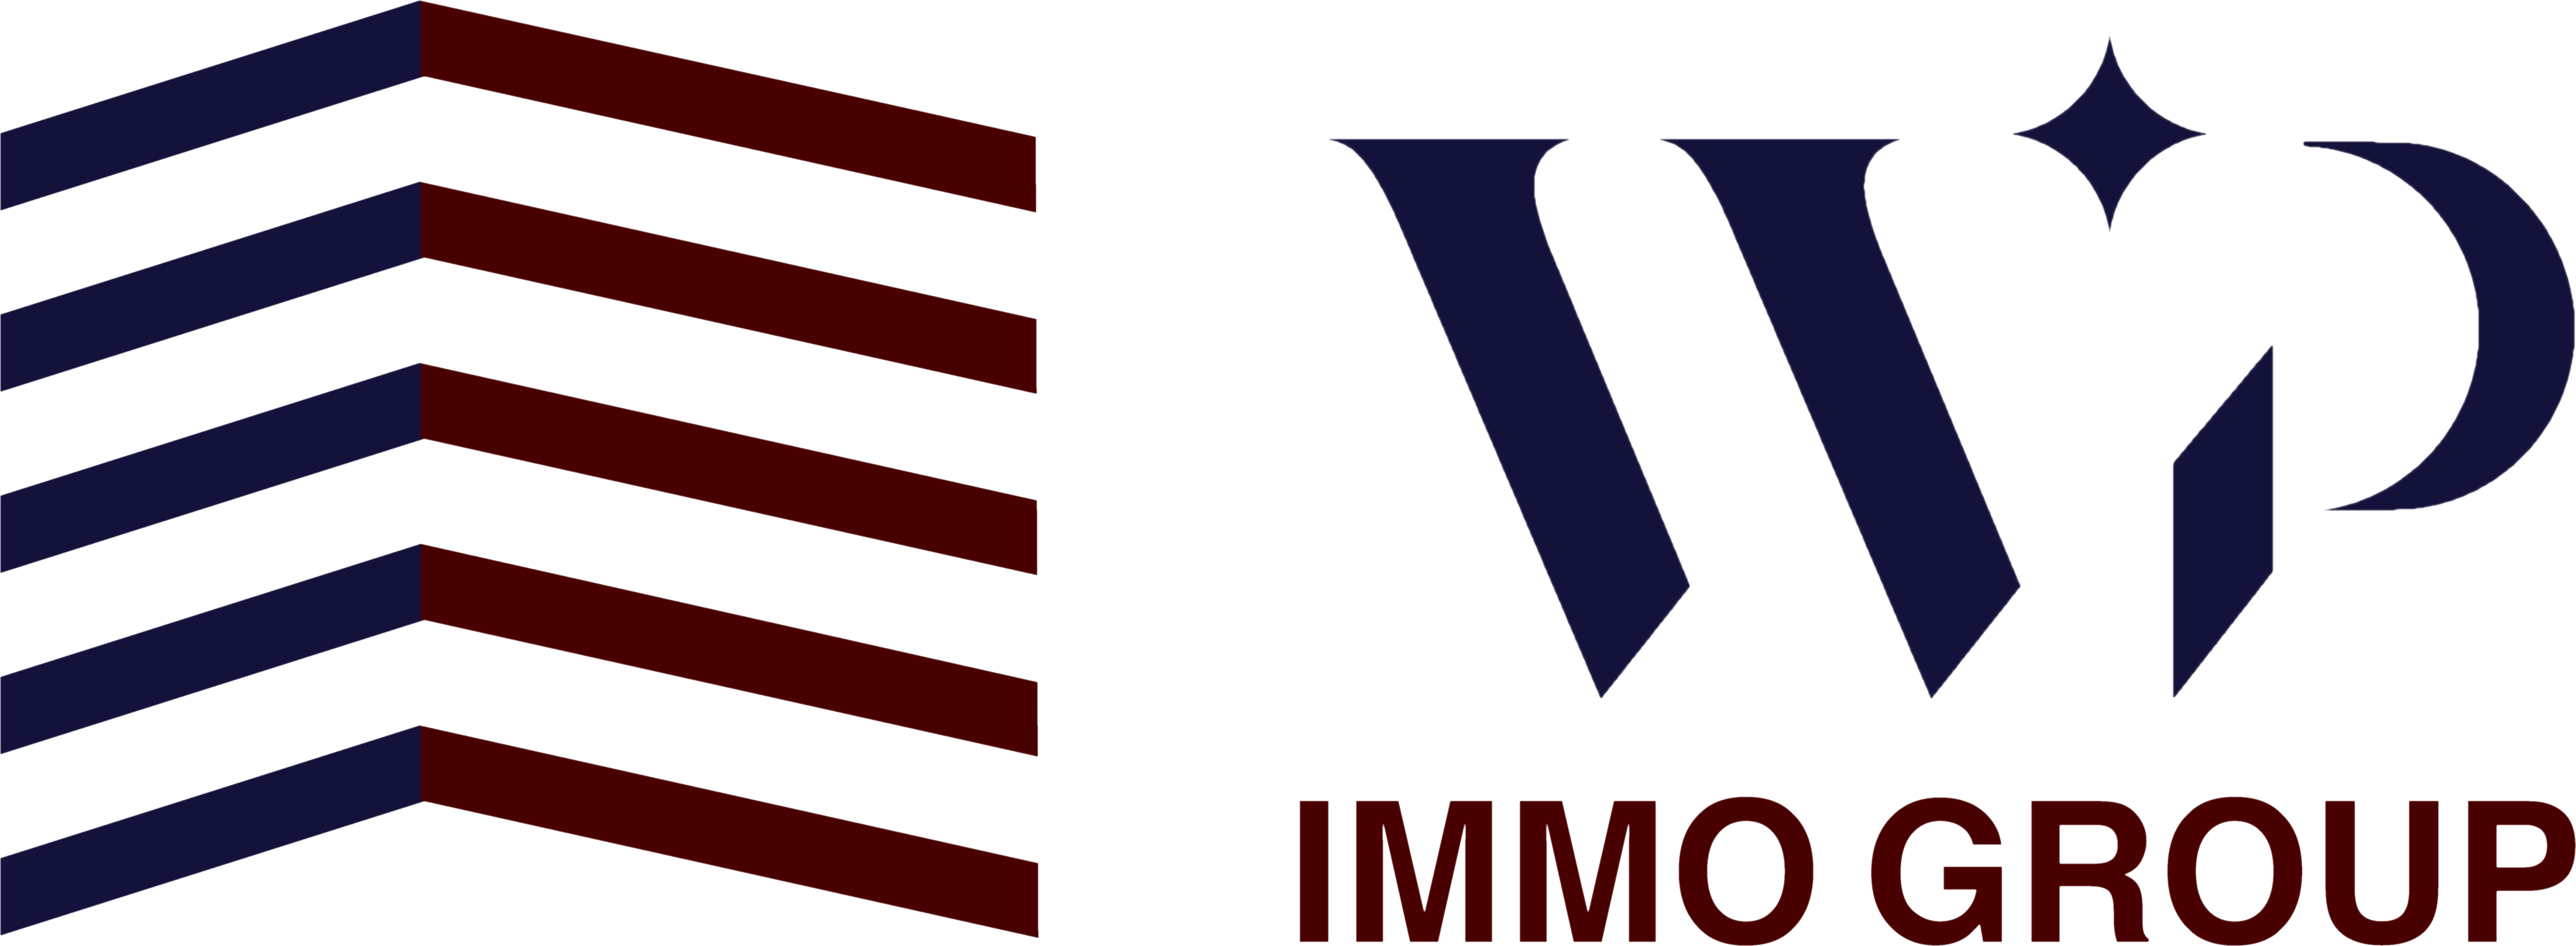 Wp Group Logo Liggend Cutout